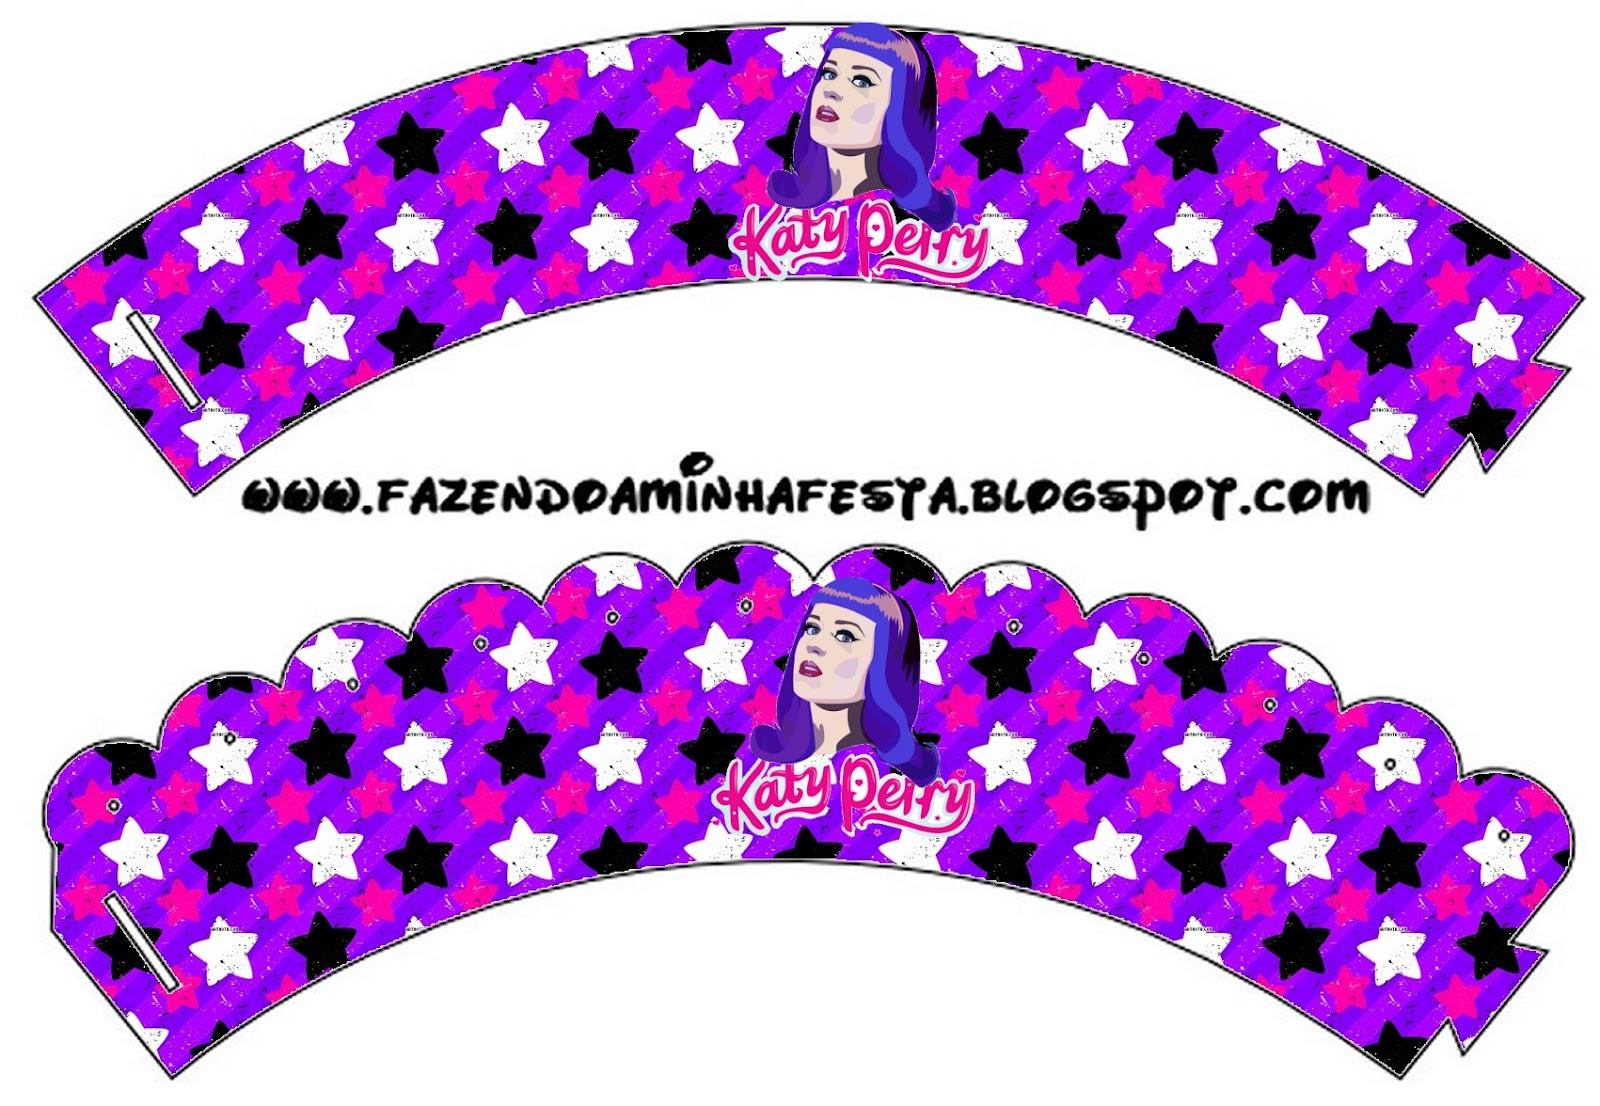 http://2.bp.blogspot.com/-Gq4KIERoCM4/UHDyJubJnfI/AAAAAAABFX0/K26eYbWve68/s1600/8+wrappers+cupcake.jpg